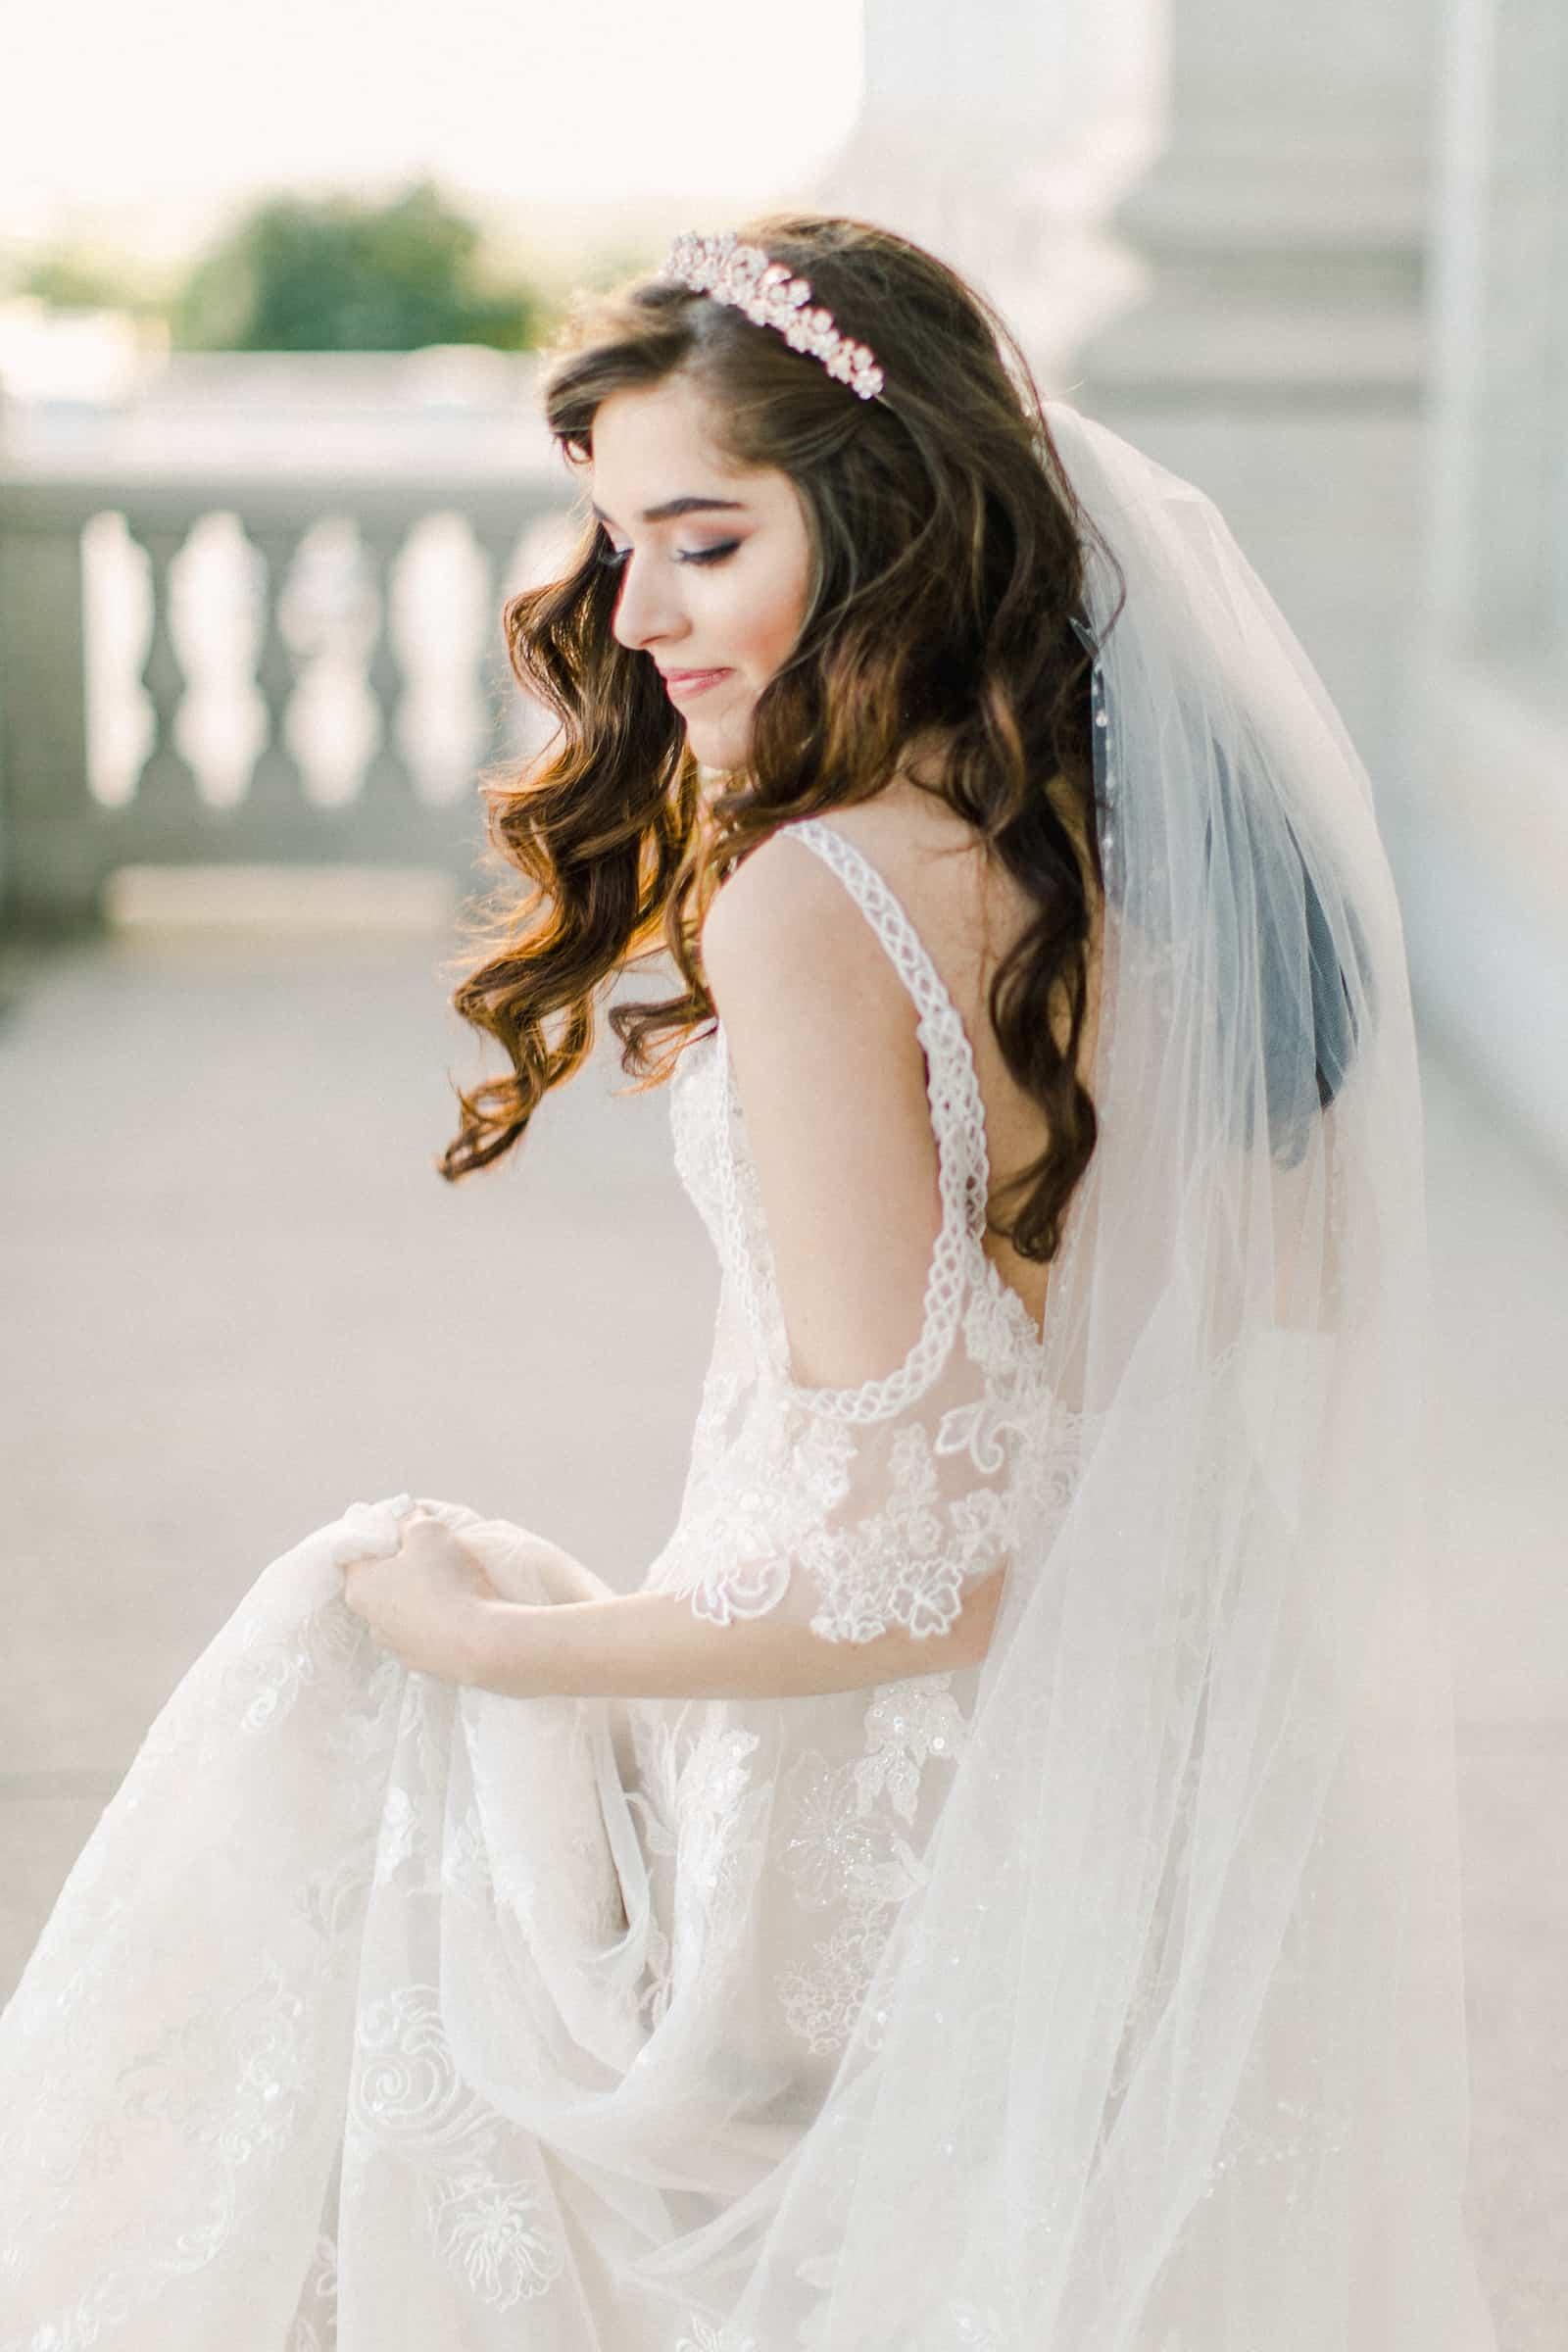 Palestinian Iranian Bride and Groom, Utah Wedding Photography at the Utah State Capitol, beautiful bride lace dress long veil